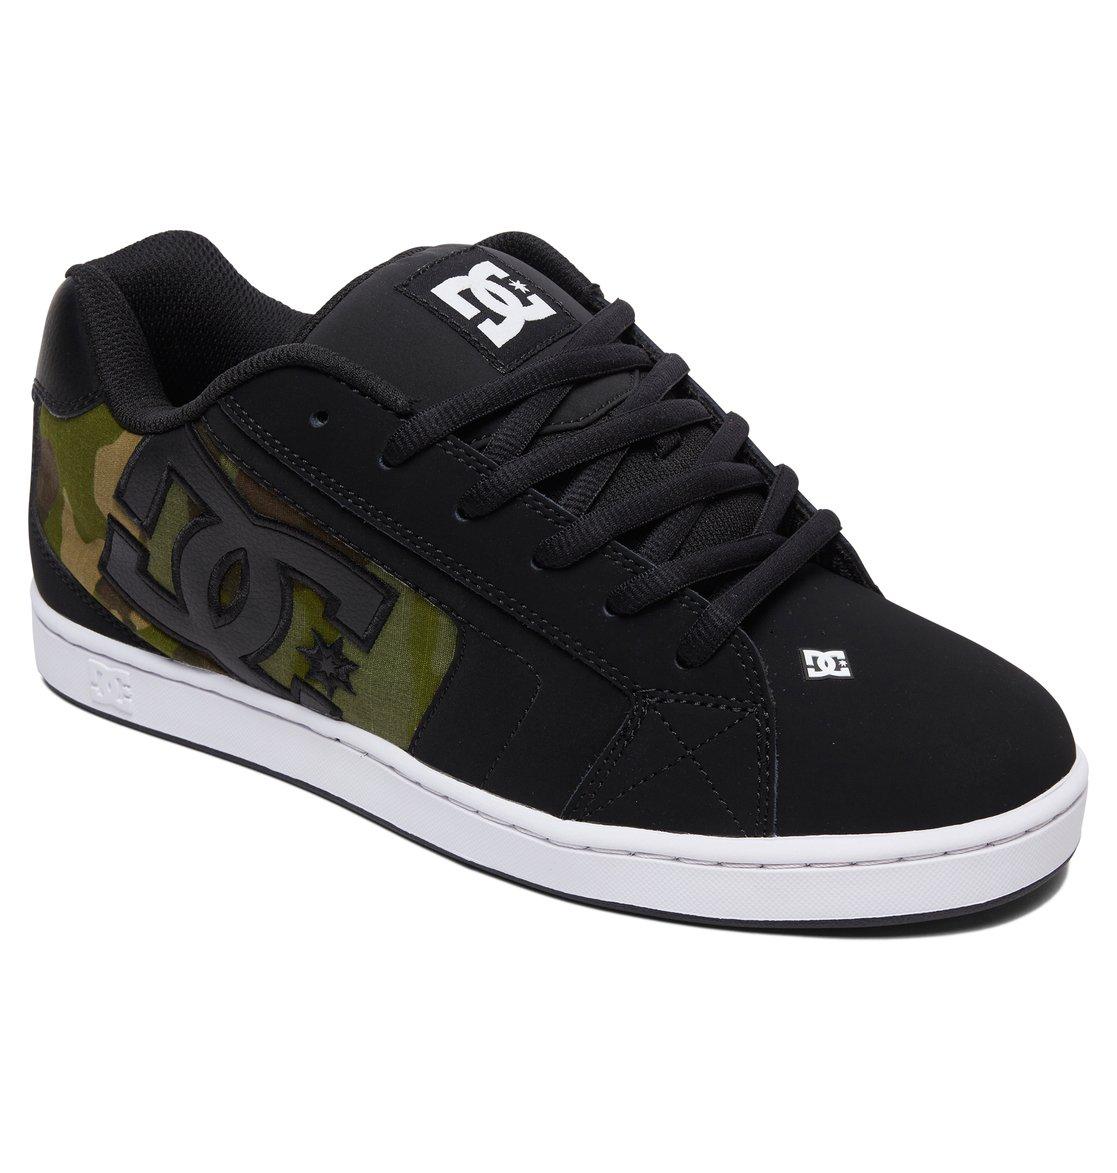 768b1e7ff Net SE Shoes